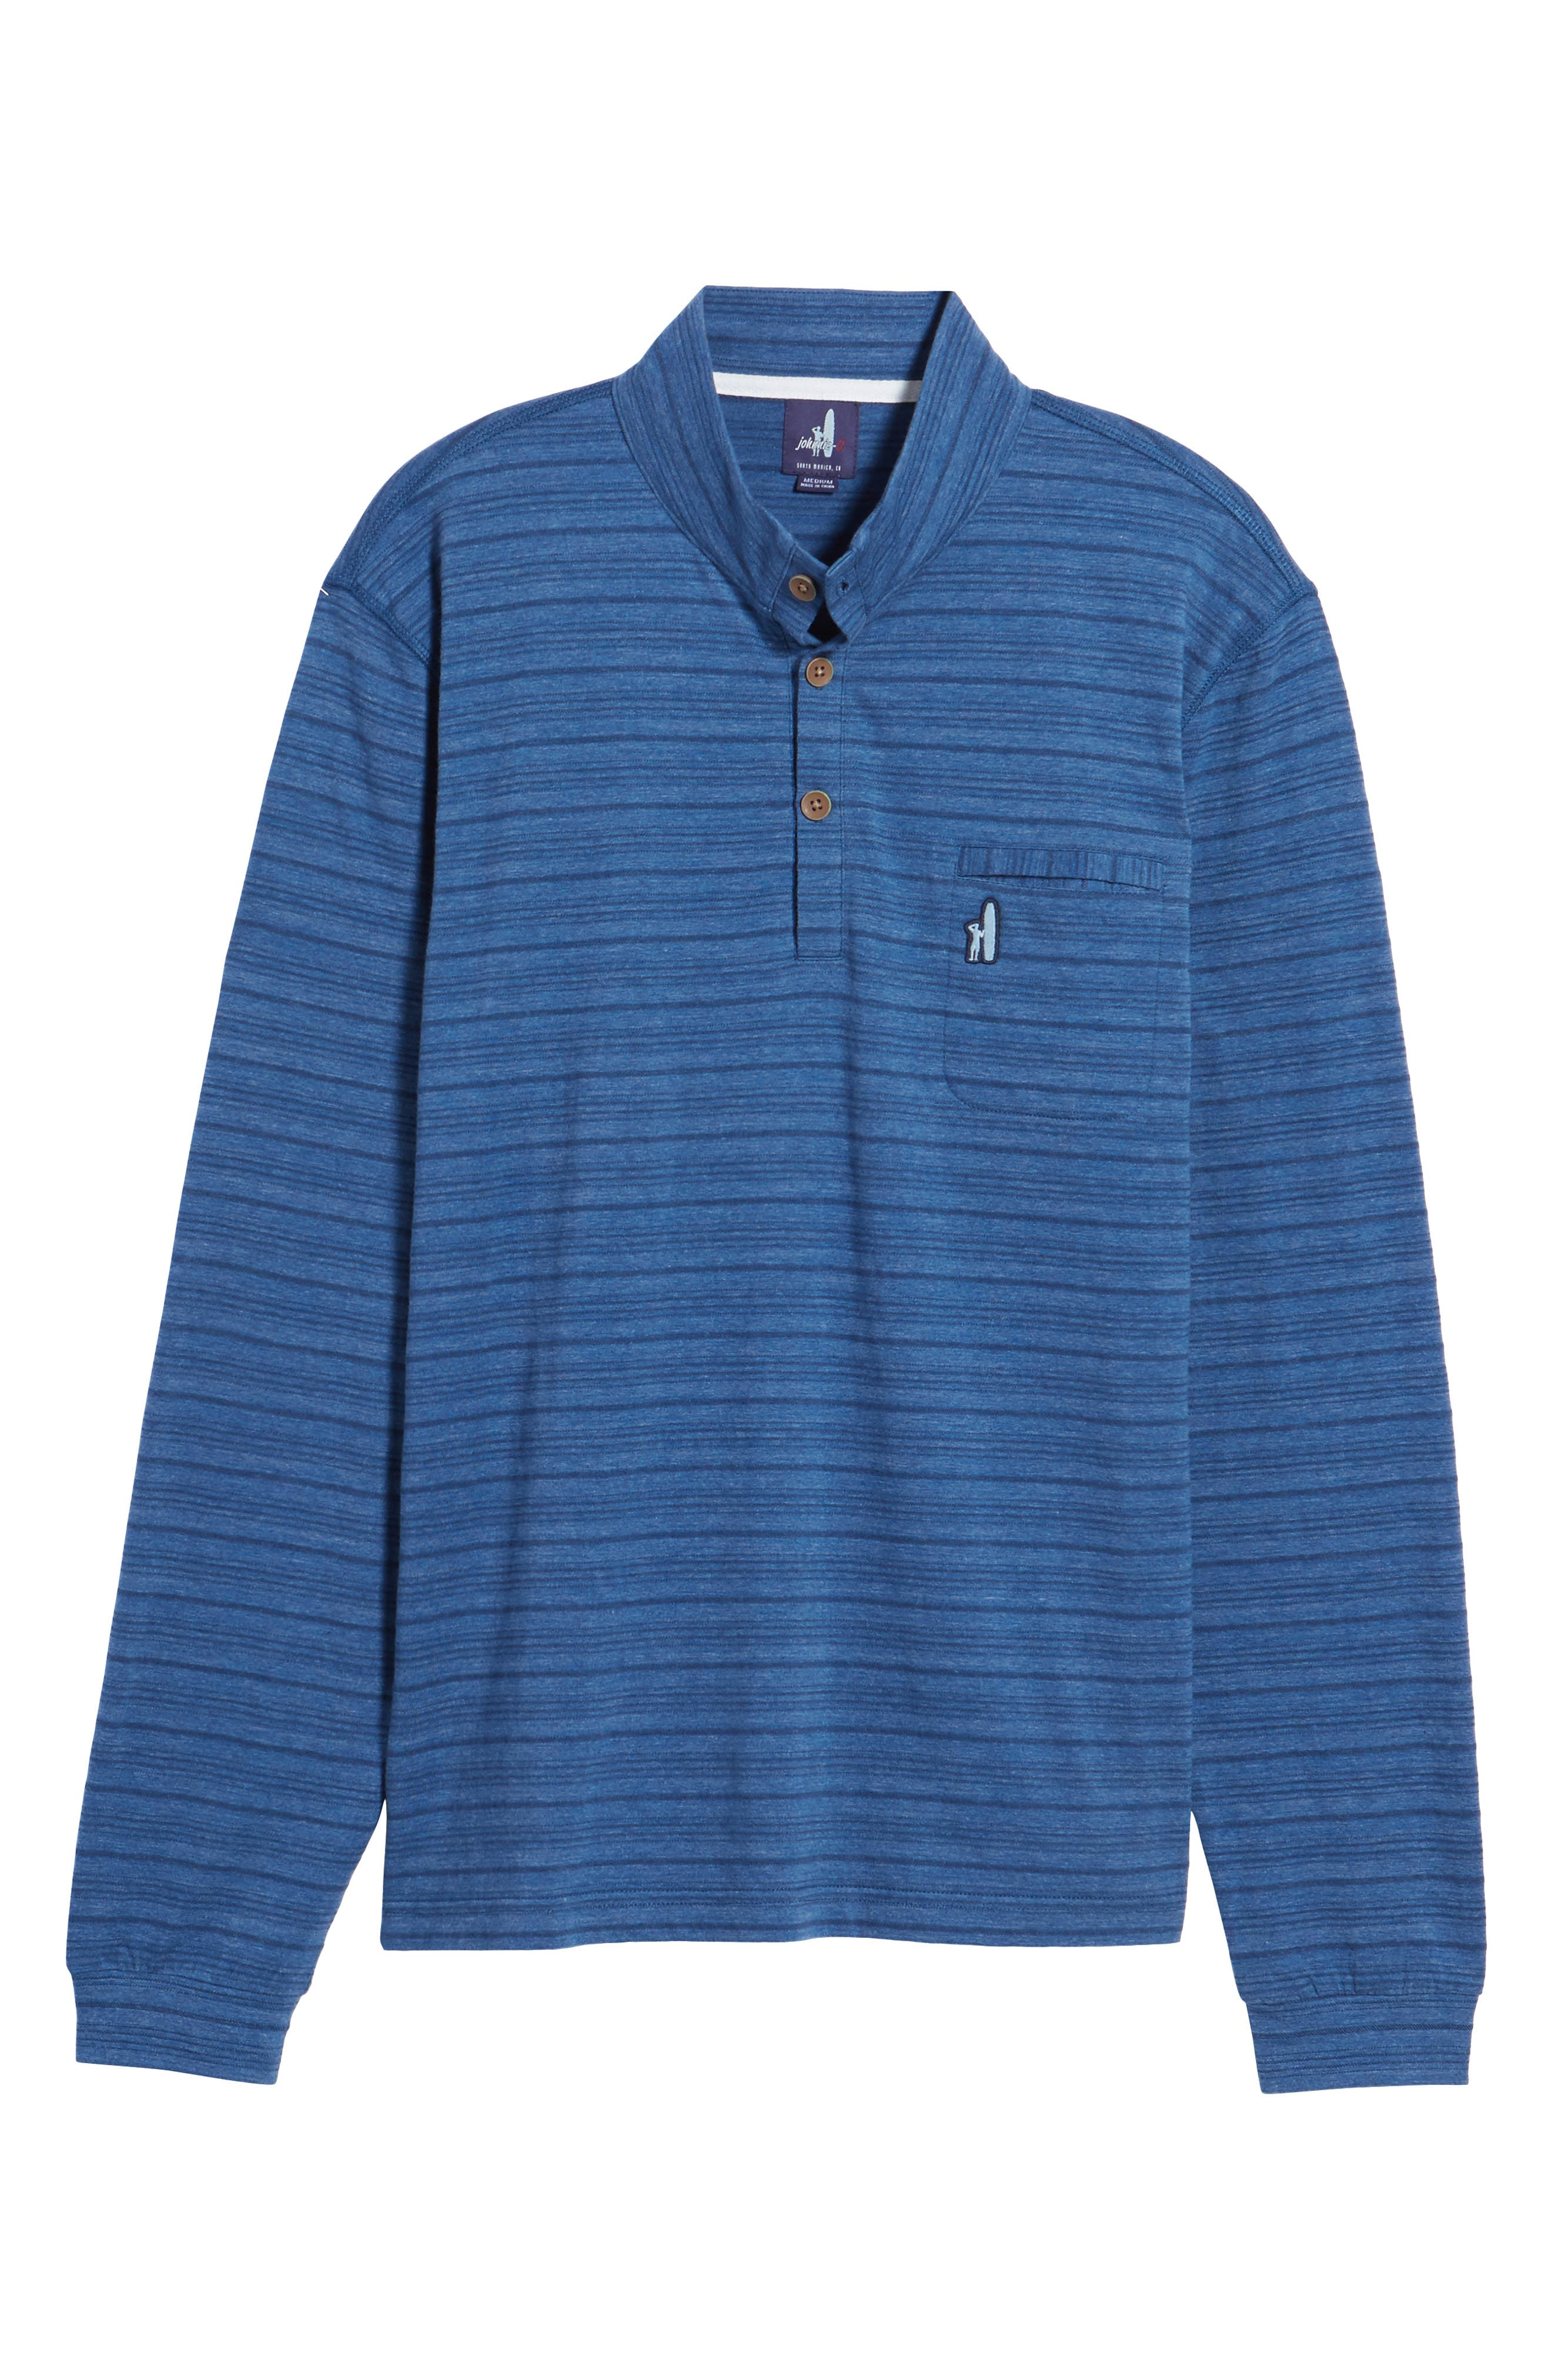 Calder Regular Fit T-Shirt,                             Alternate thumbnail 6, color,                             200